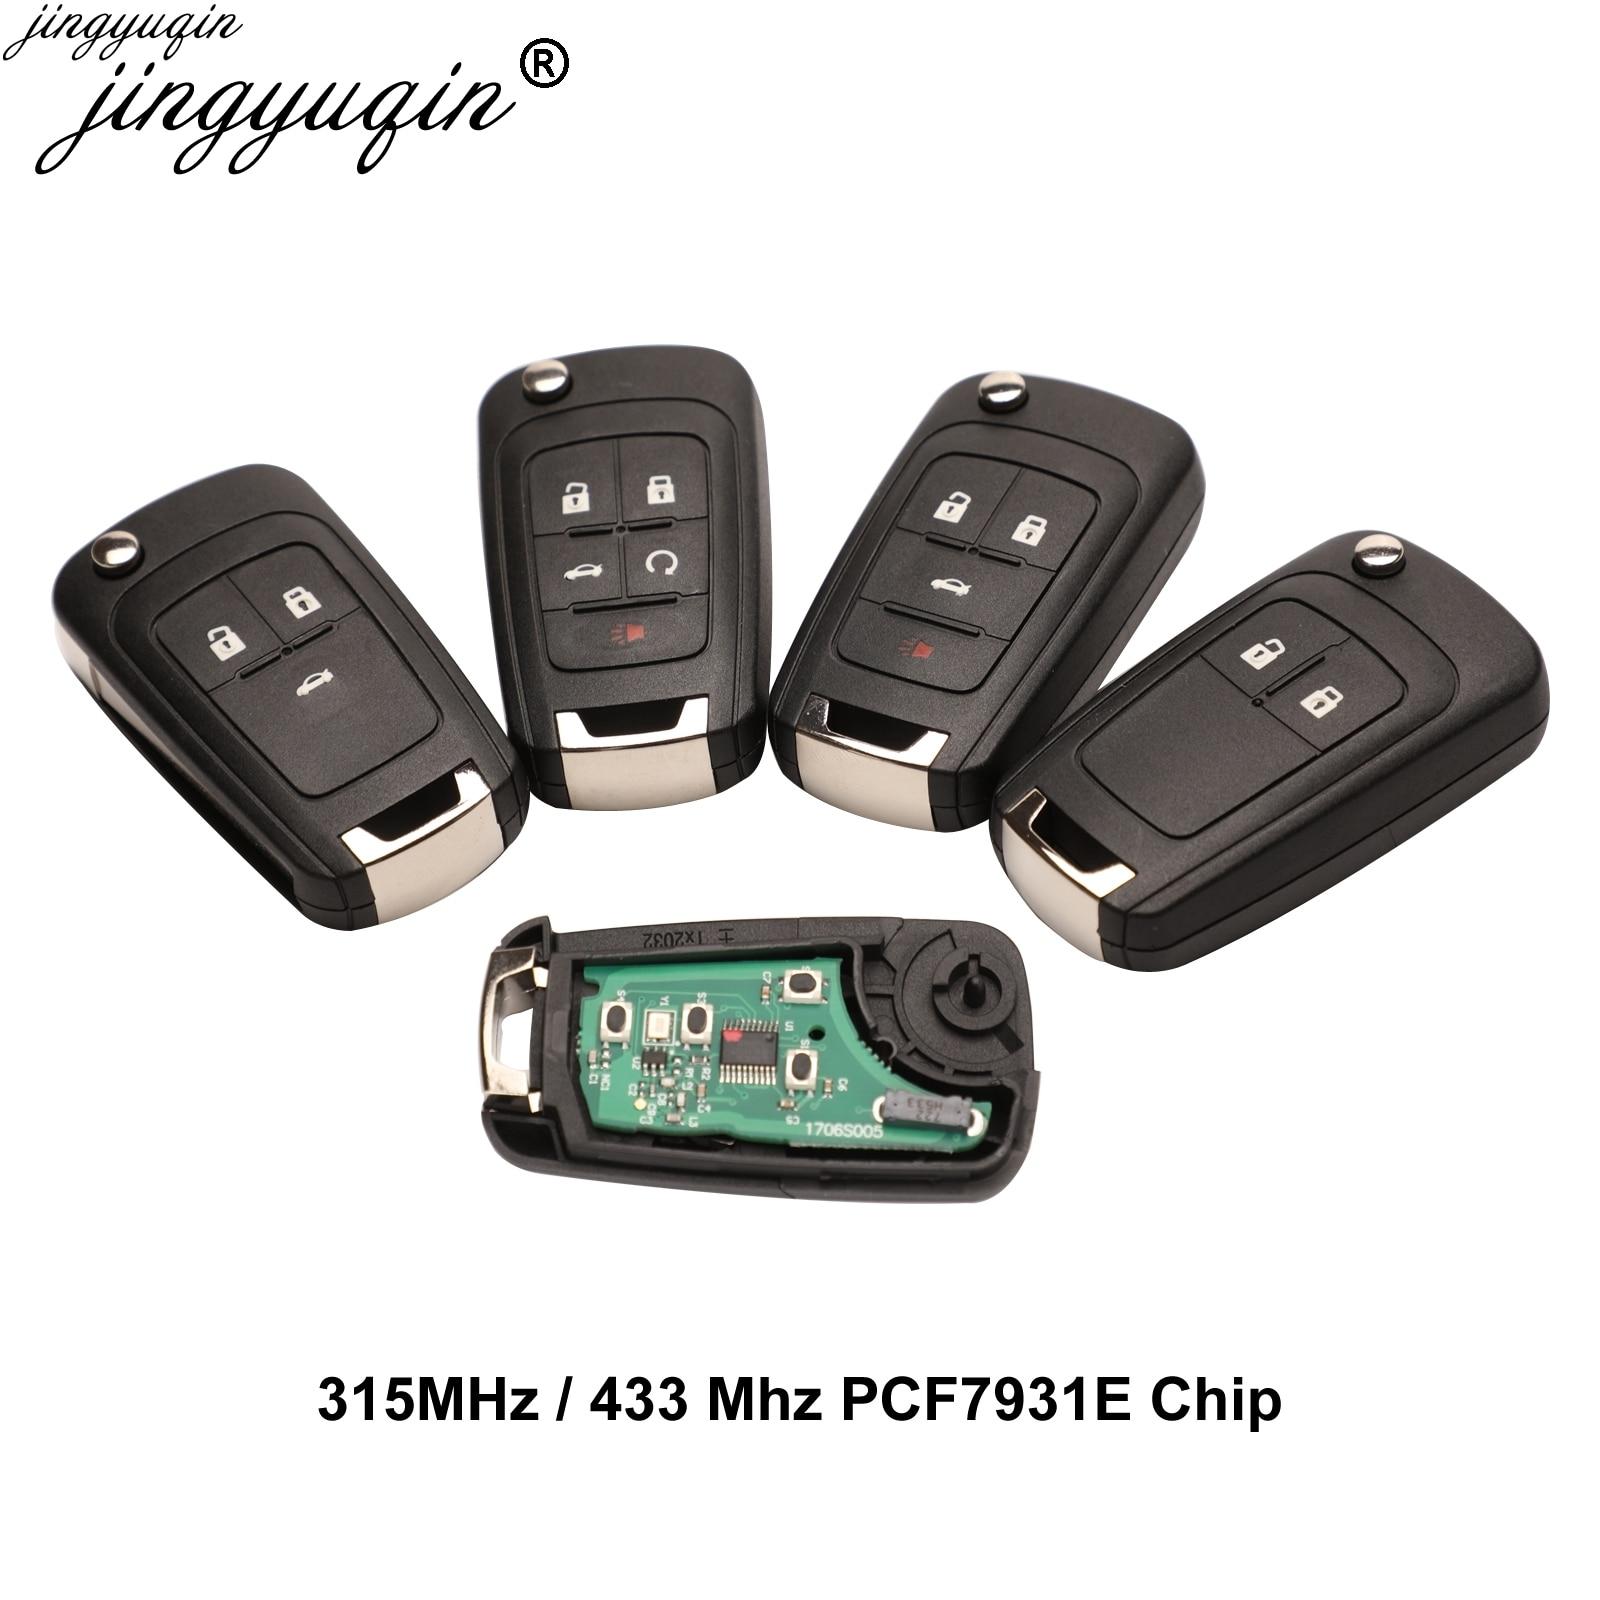 Jingyuan carro remoto chave terno para chevrolet malibu cruze aveo vela faísca 2/3/4 botões 315/433mhz id46 pcf7931e chip chave